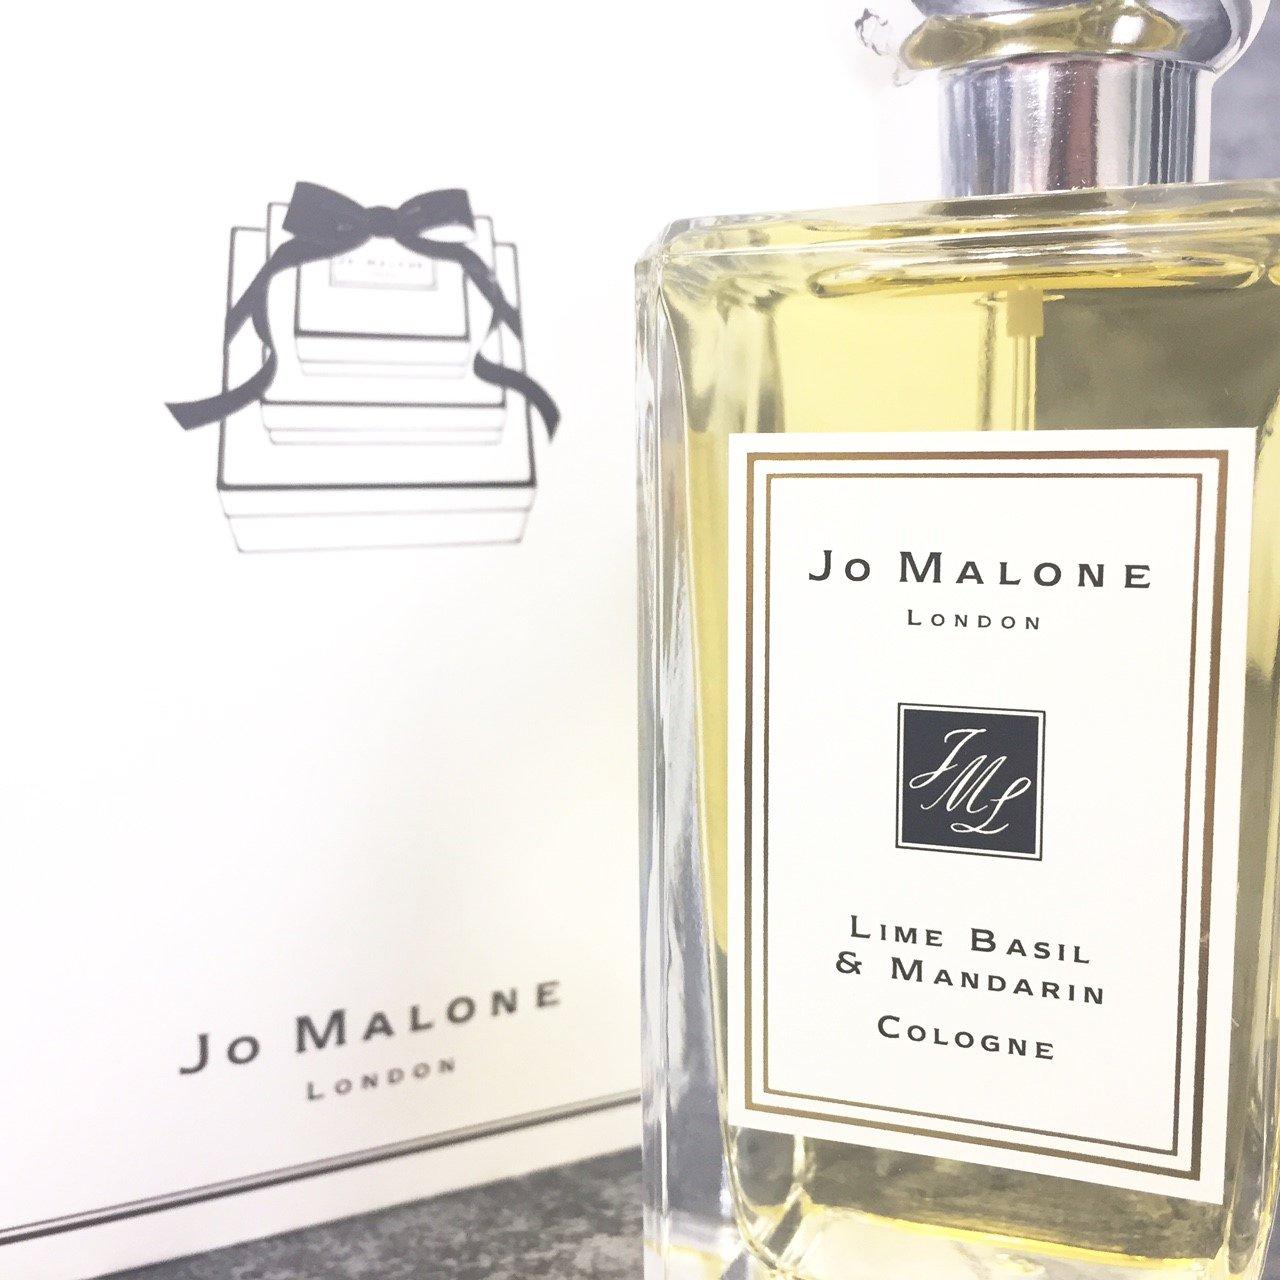 JO MALONE Lime Basil Mandarin 青檸羅勒 & 柑橘香水 100ML◐香水綁馬尾◐